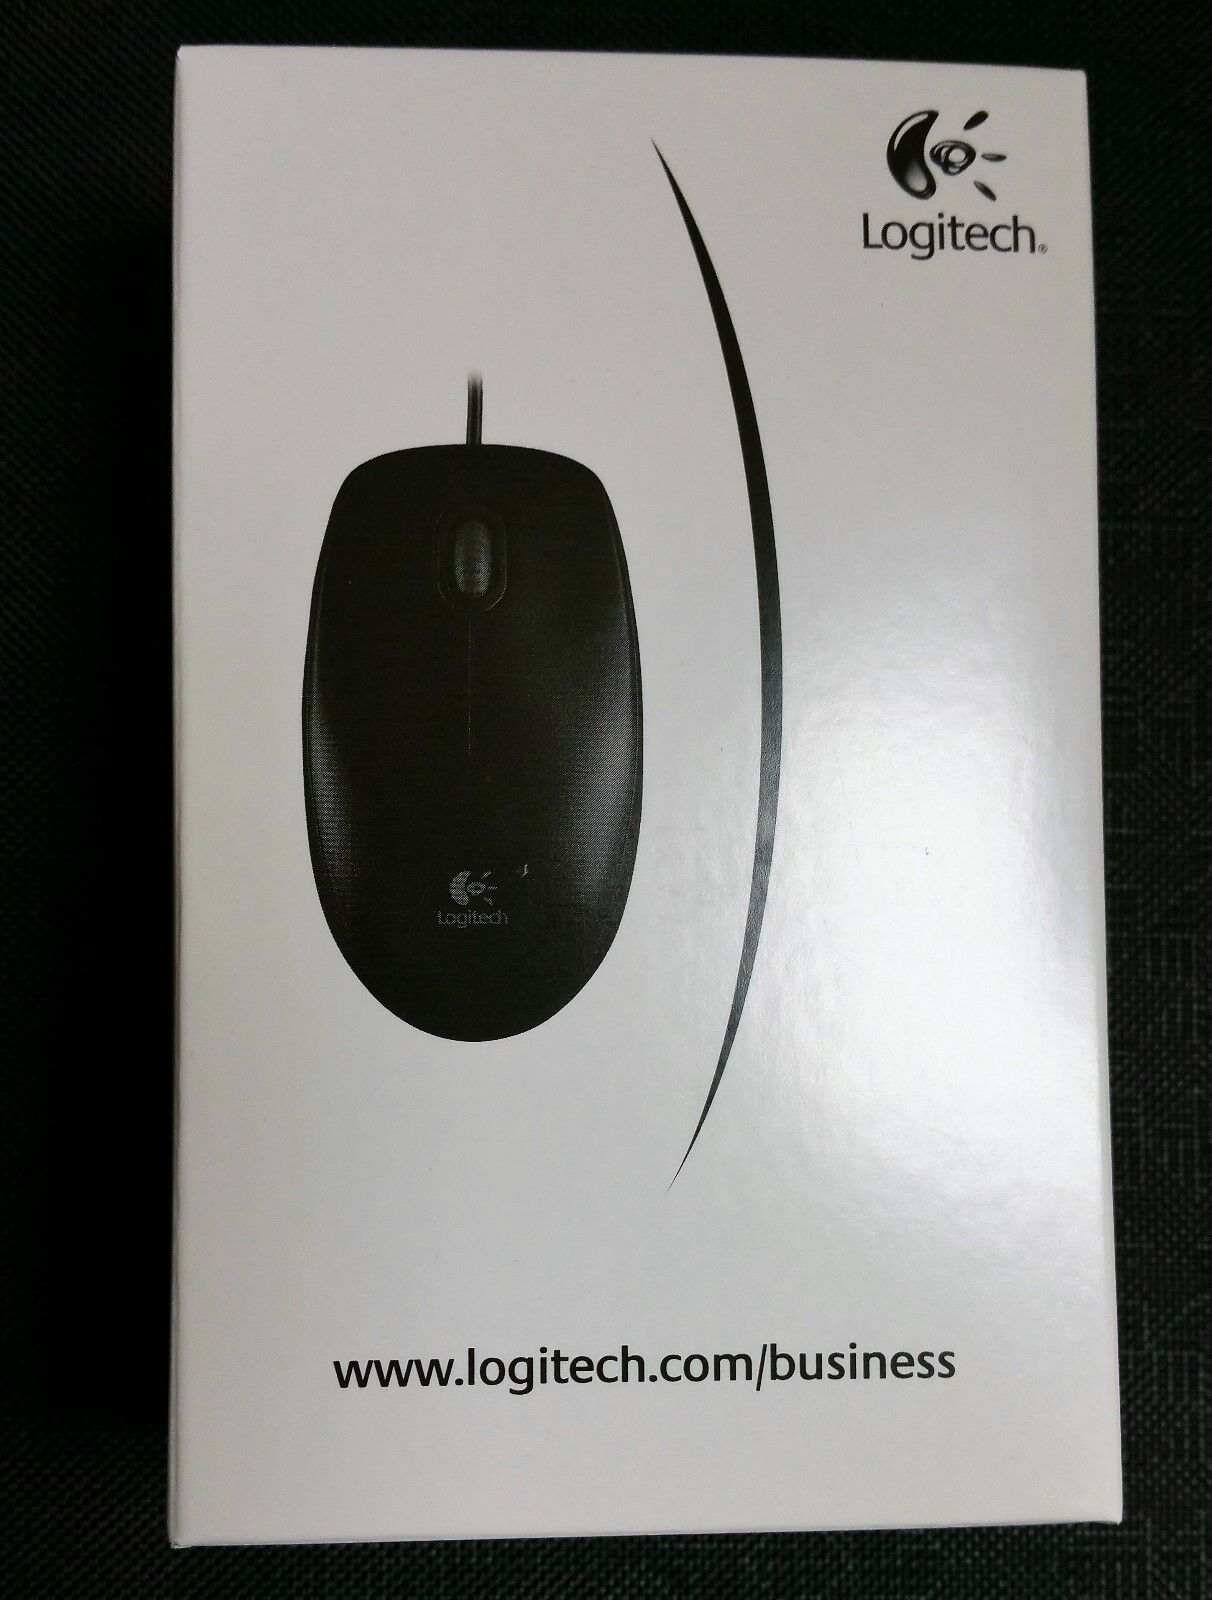 Logitech B100 Optical Mouse 800 DPI 3 Button - Symmetrical